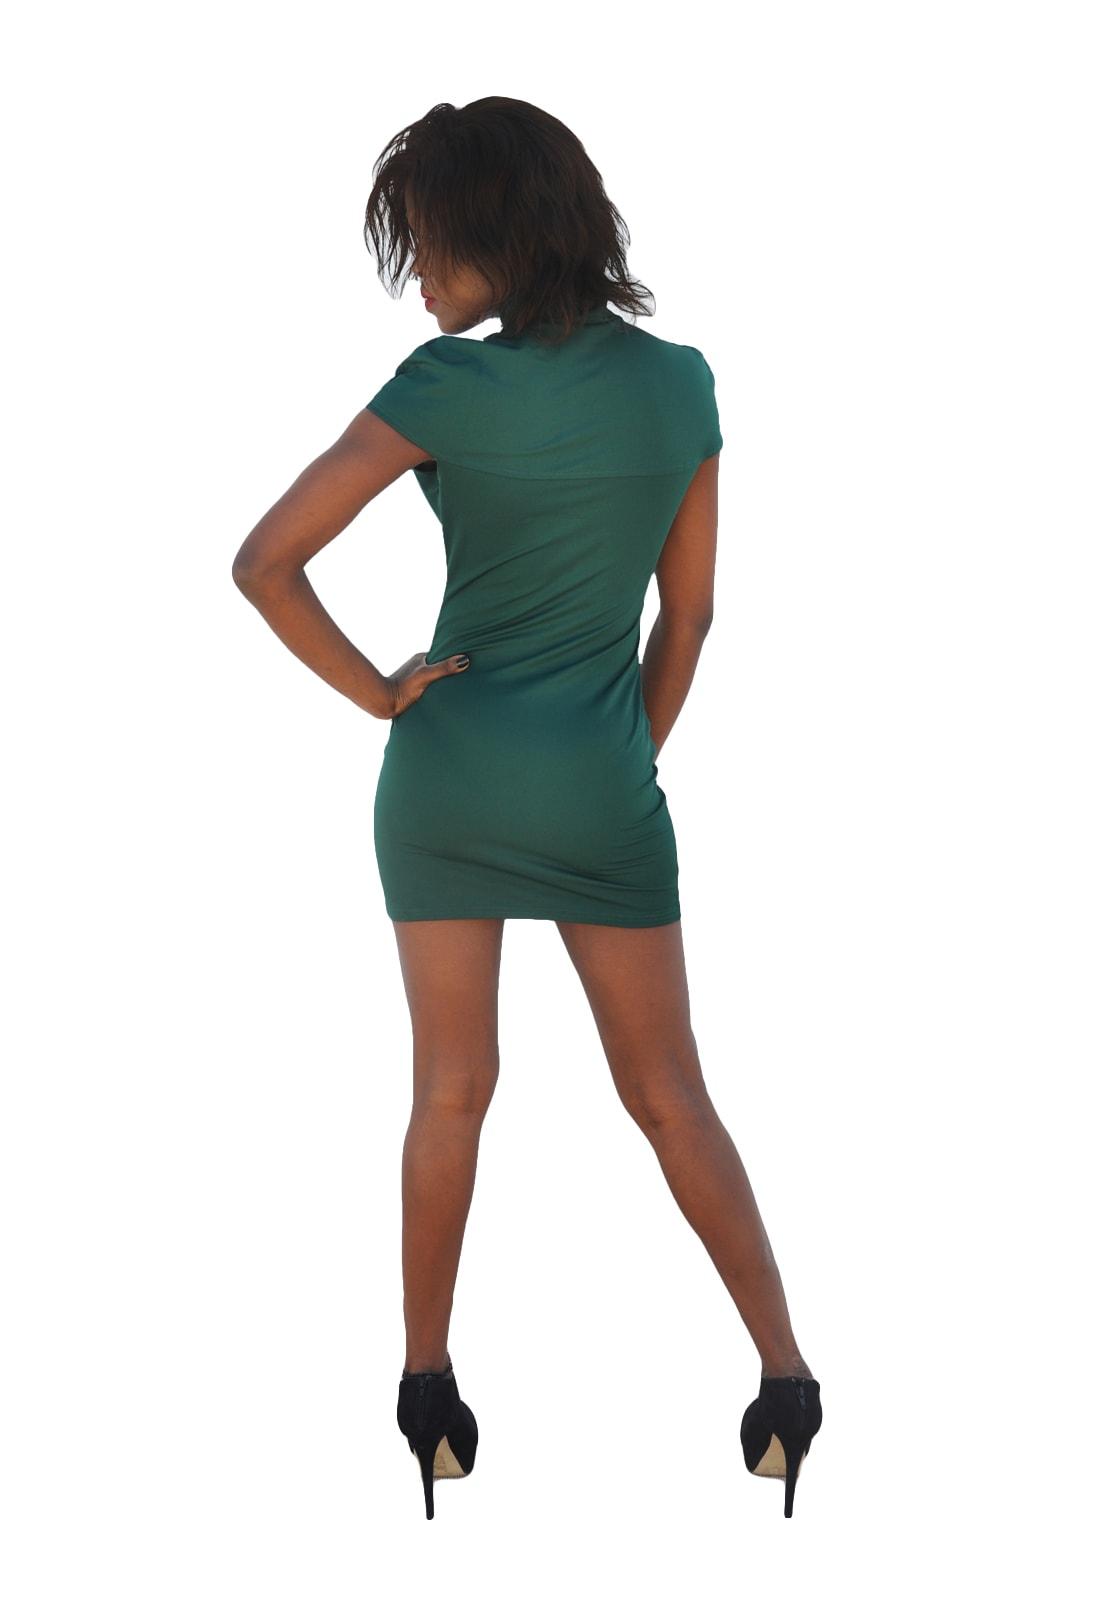 M0256 green2 Sleeveless Dresses maureens.com boutique